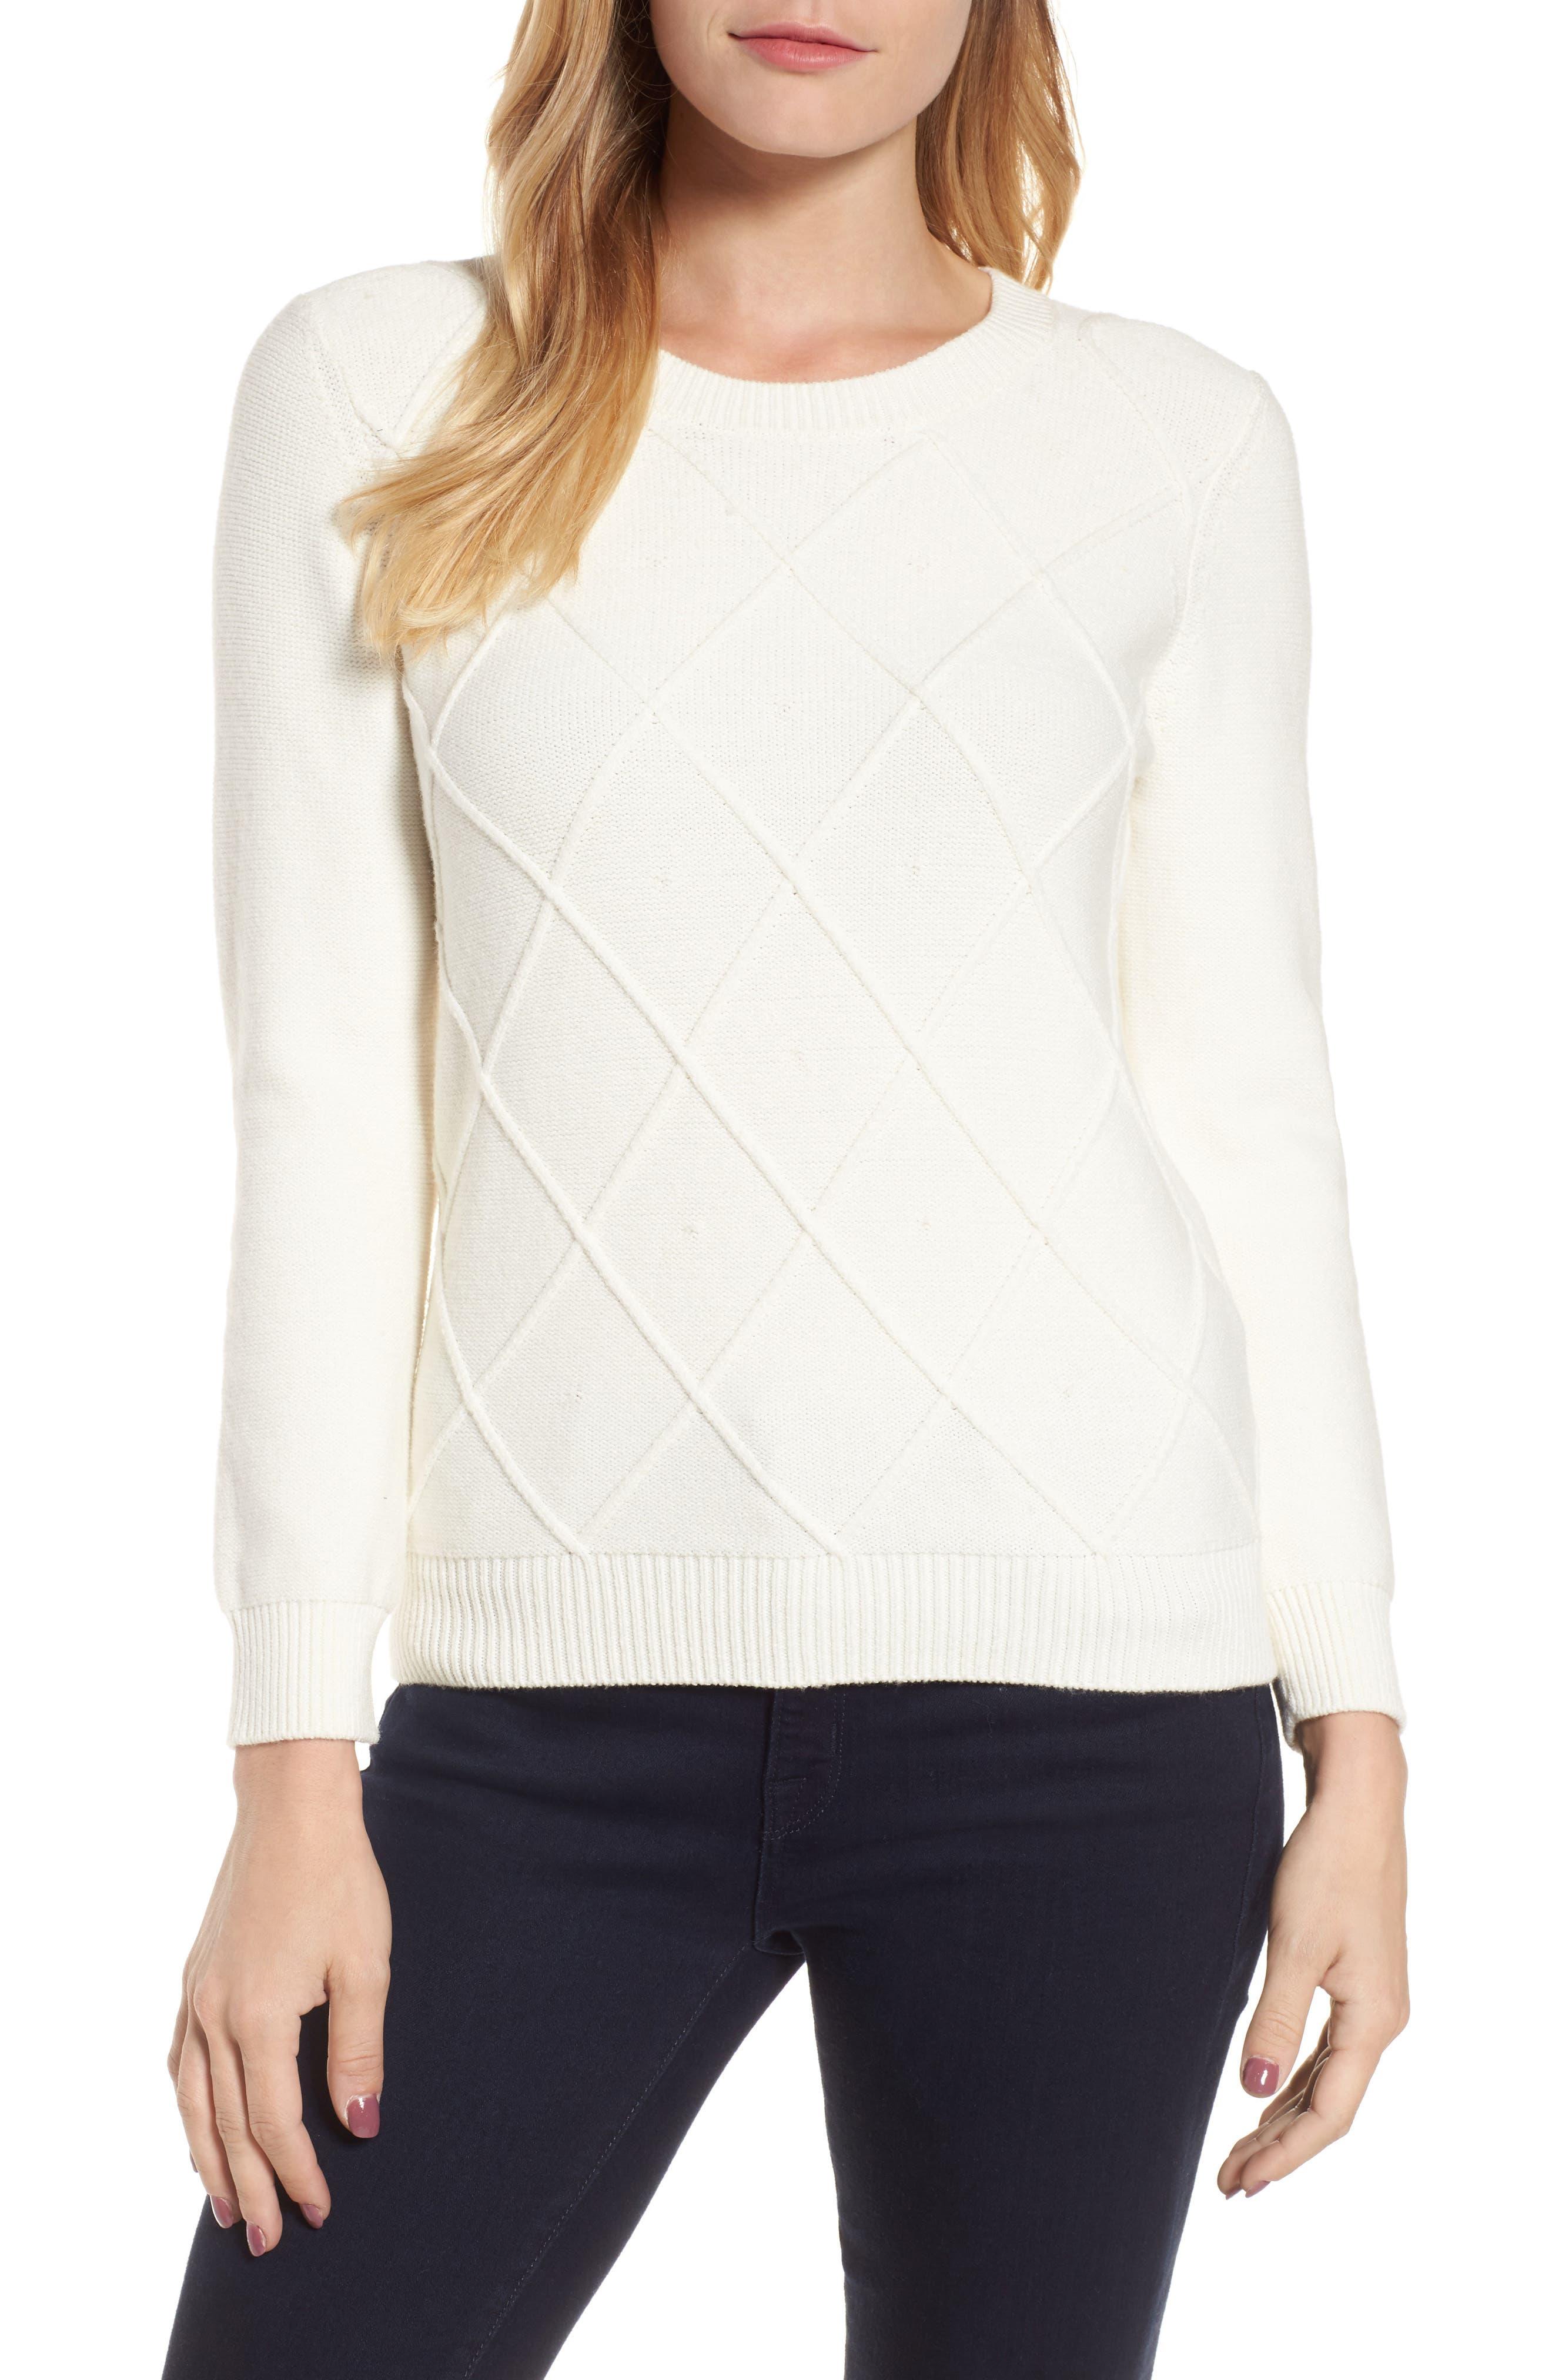 Draper James Argyle Dot Sweater